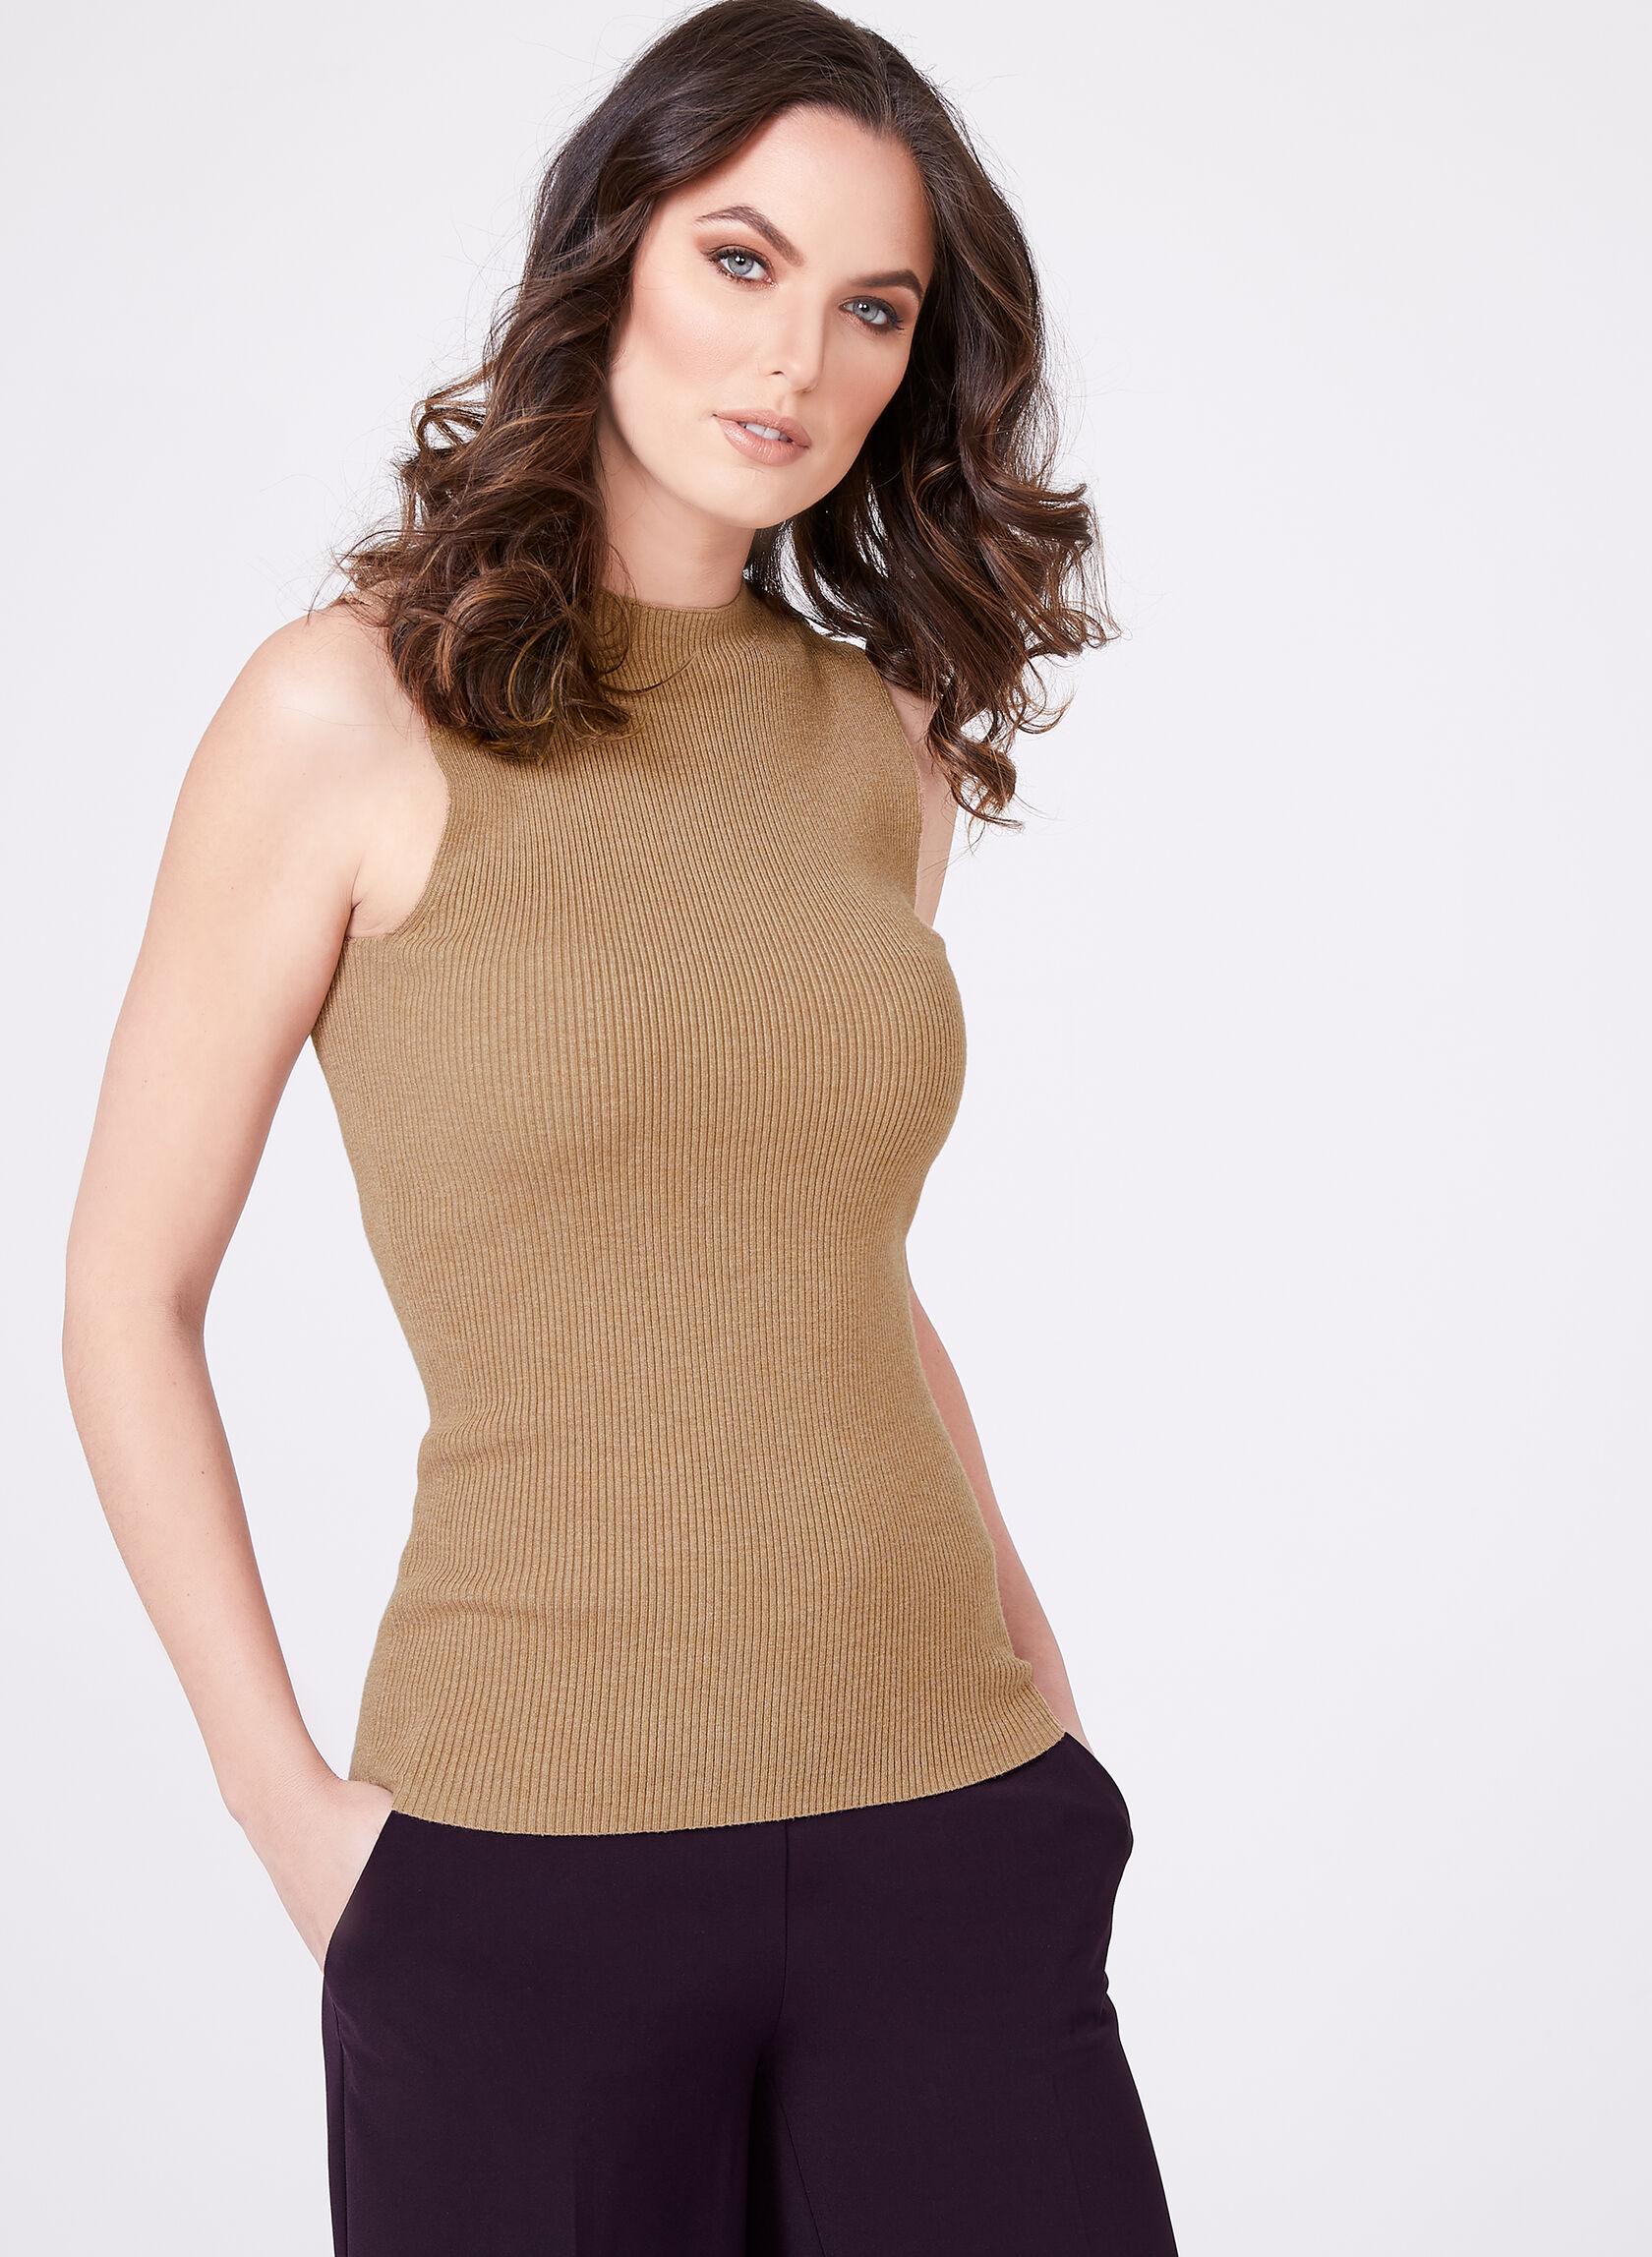 Sleeveless Mock Turtleneck Sweater Melanie Lyne